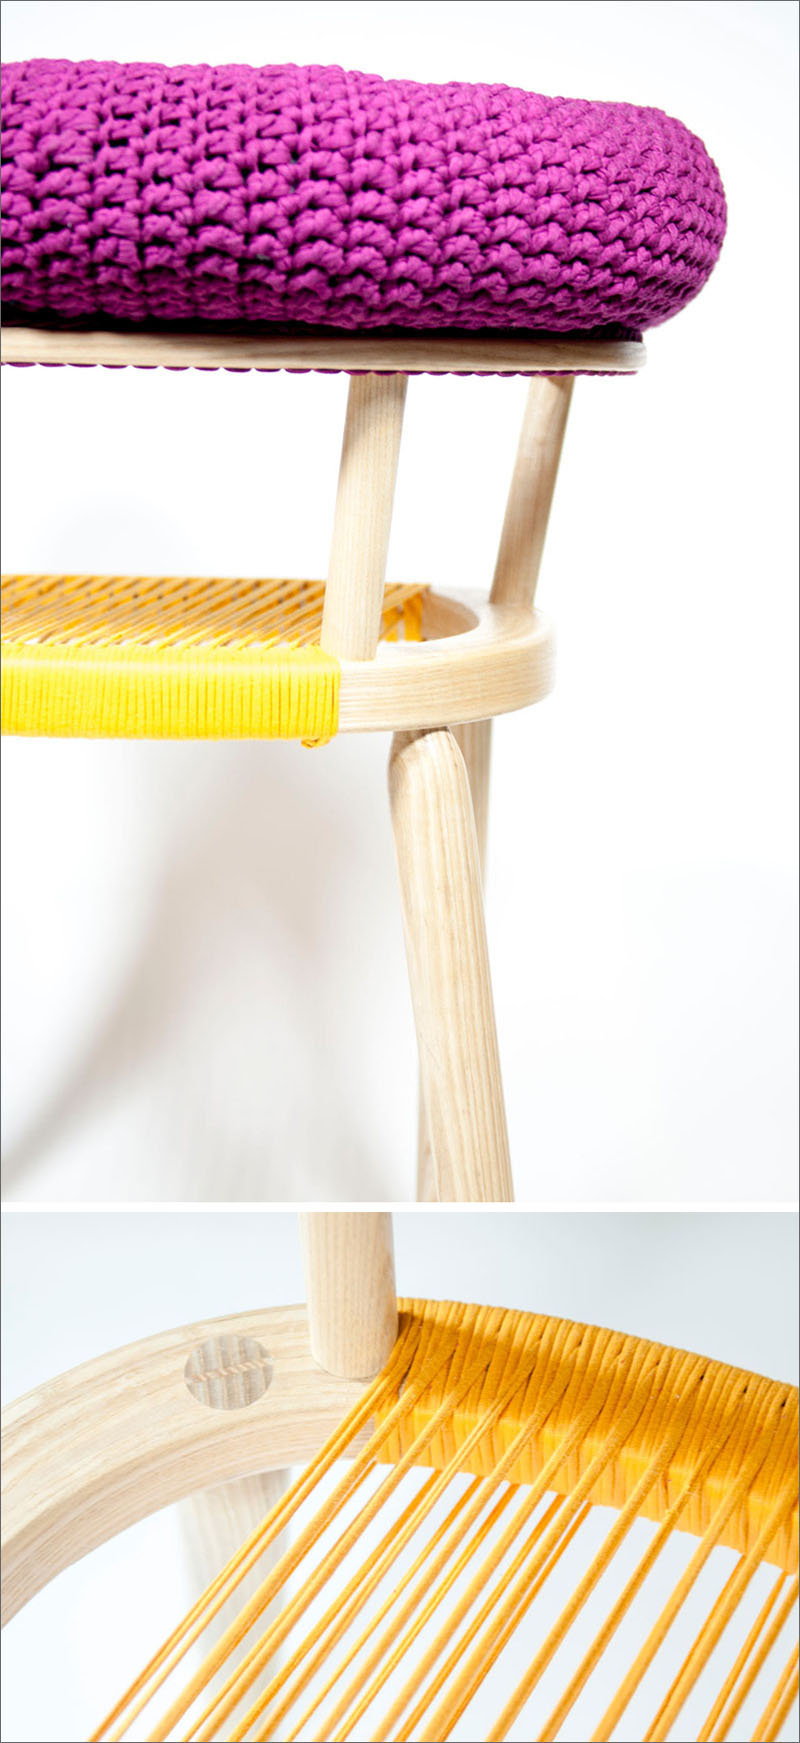 contemporary-furniture-design-171216-904-05